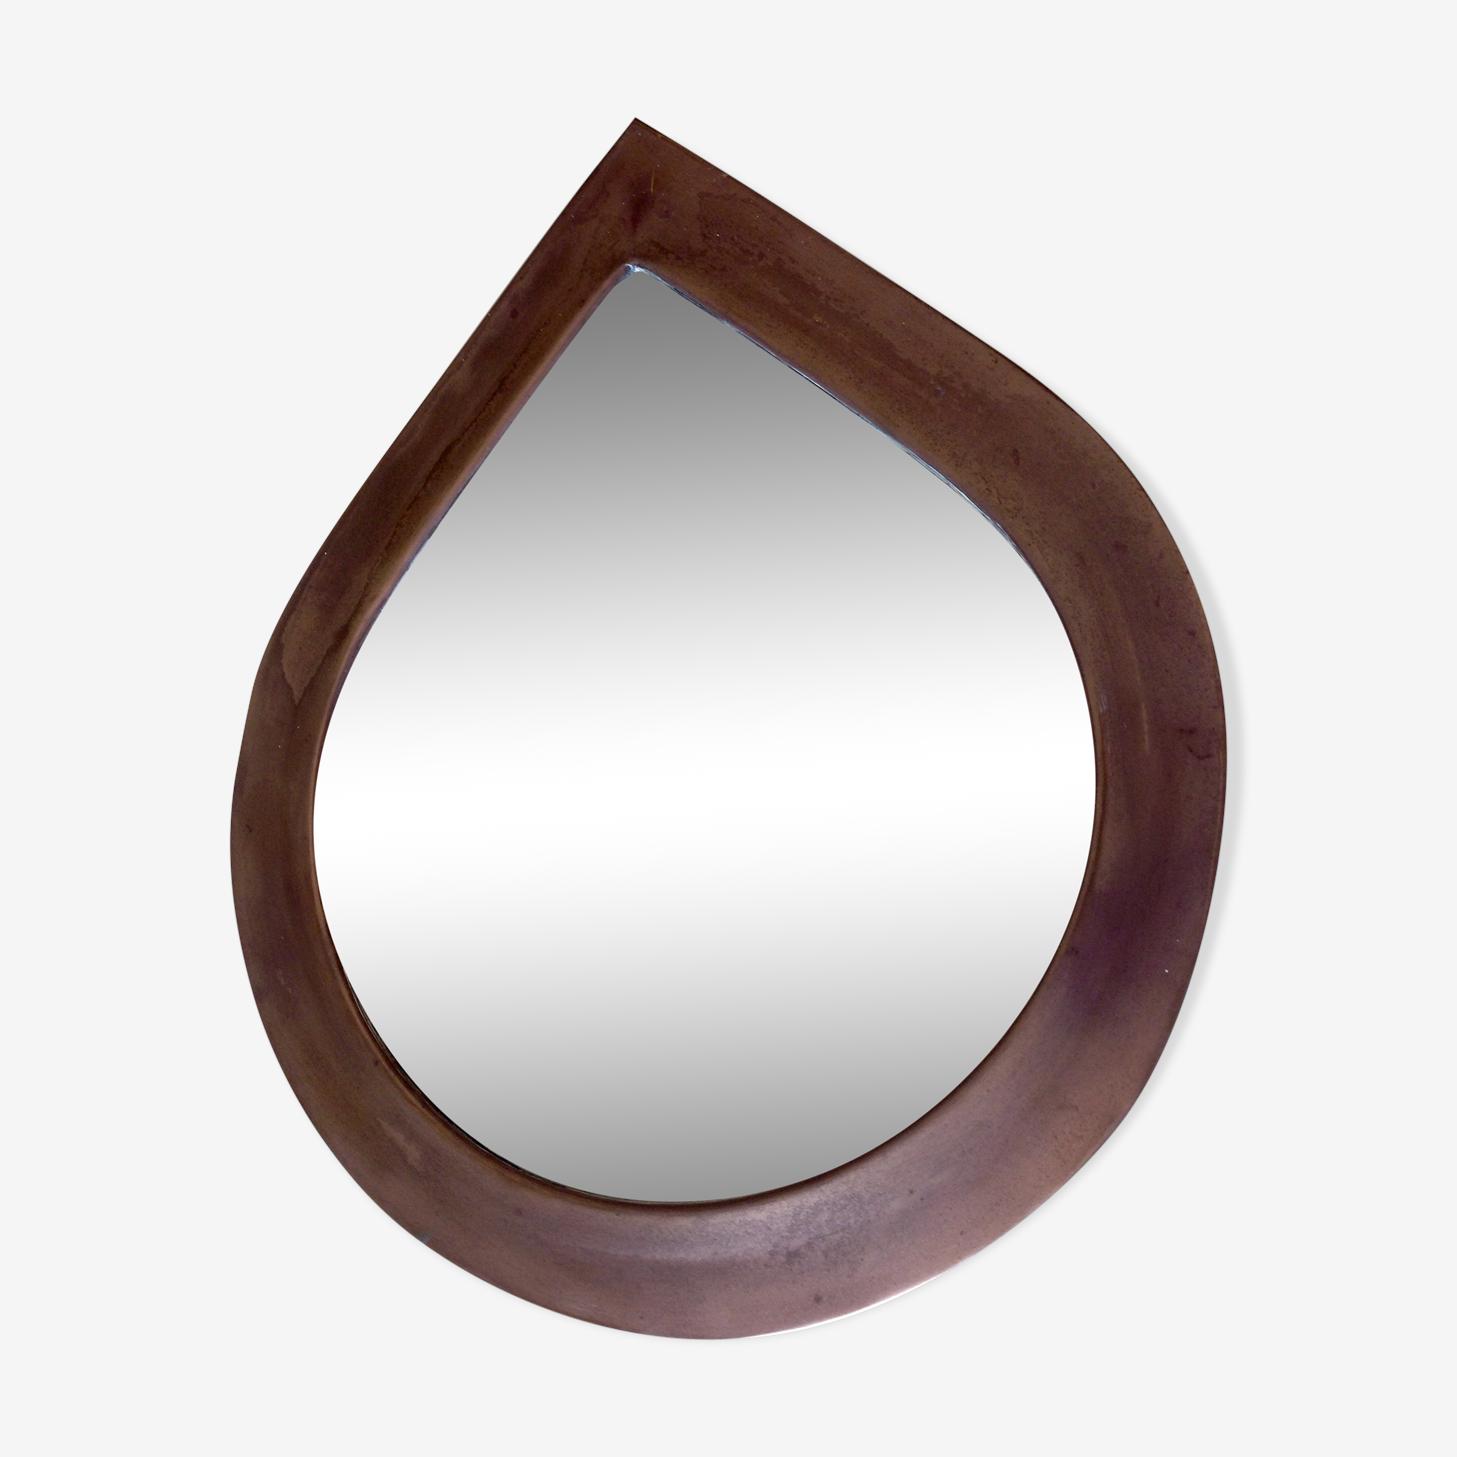 70s copper drop mirror 34x28cm